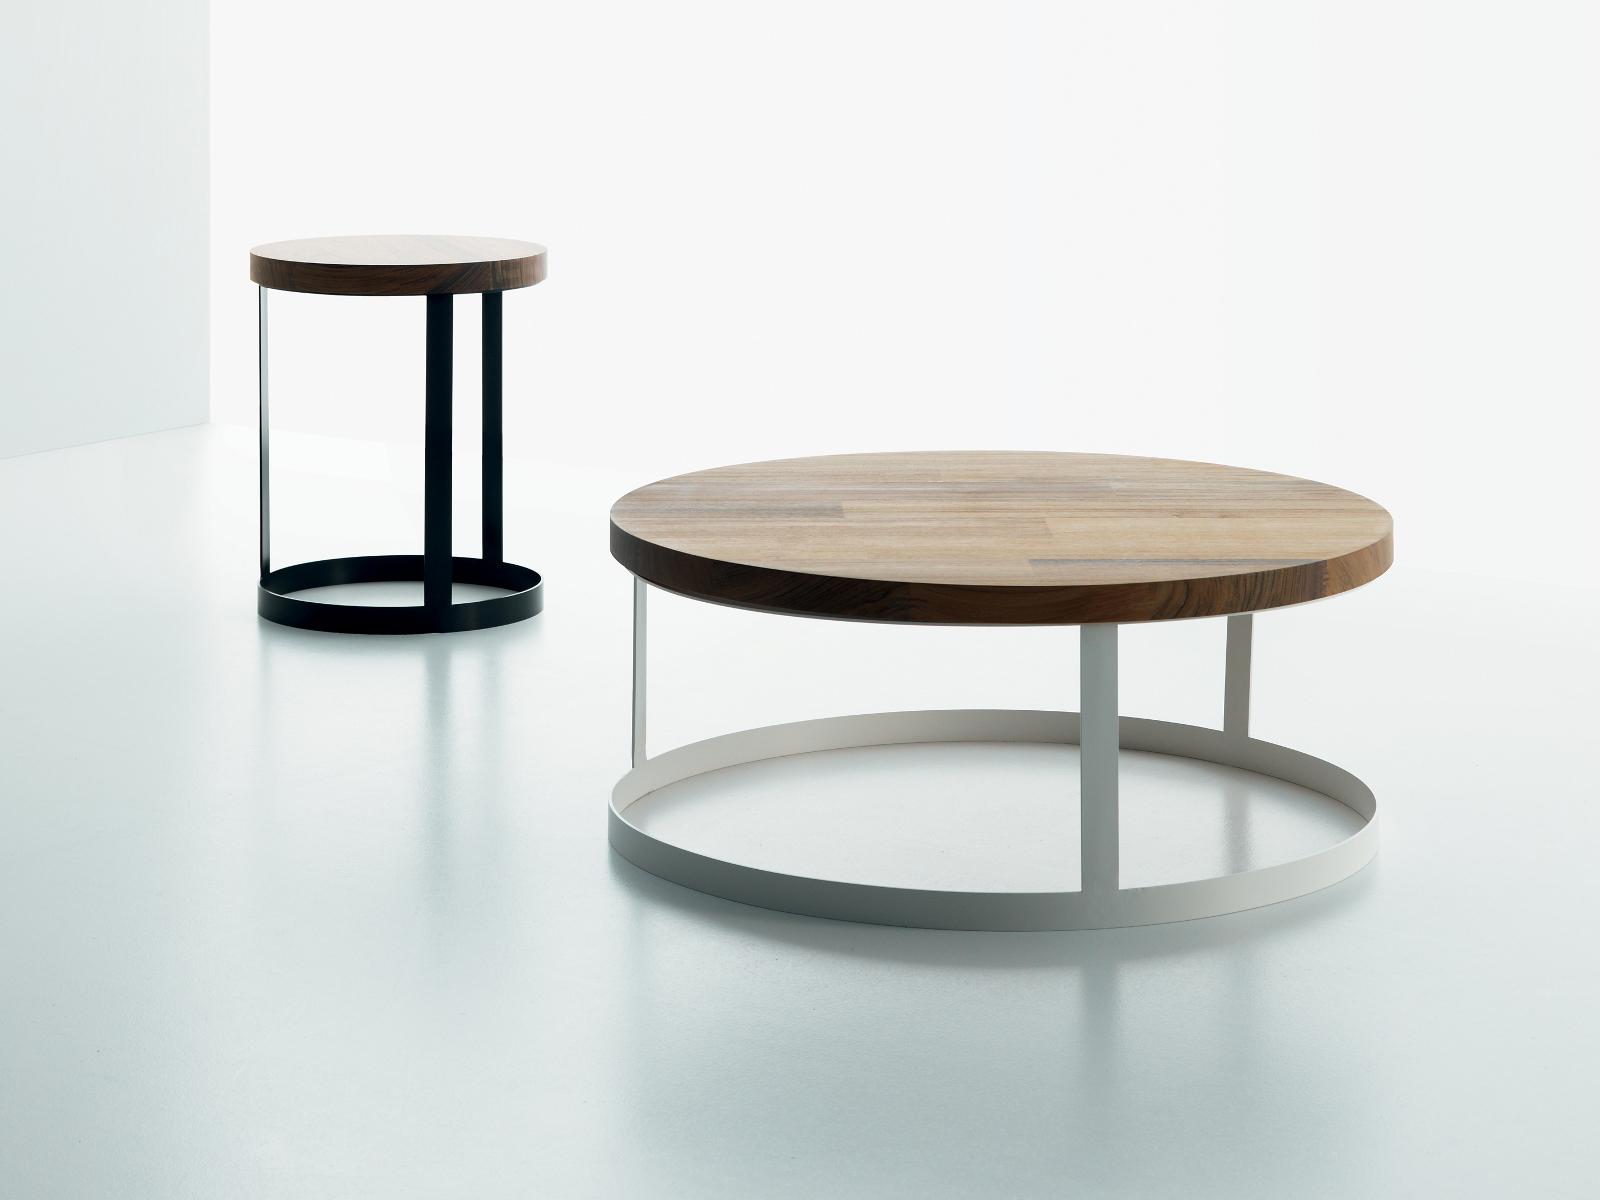 metal coffee table design photo - 7